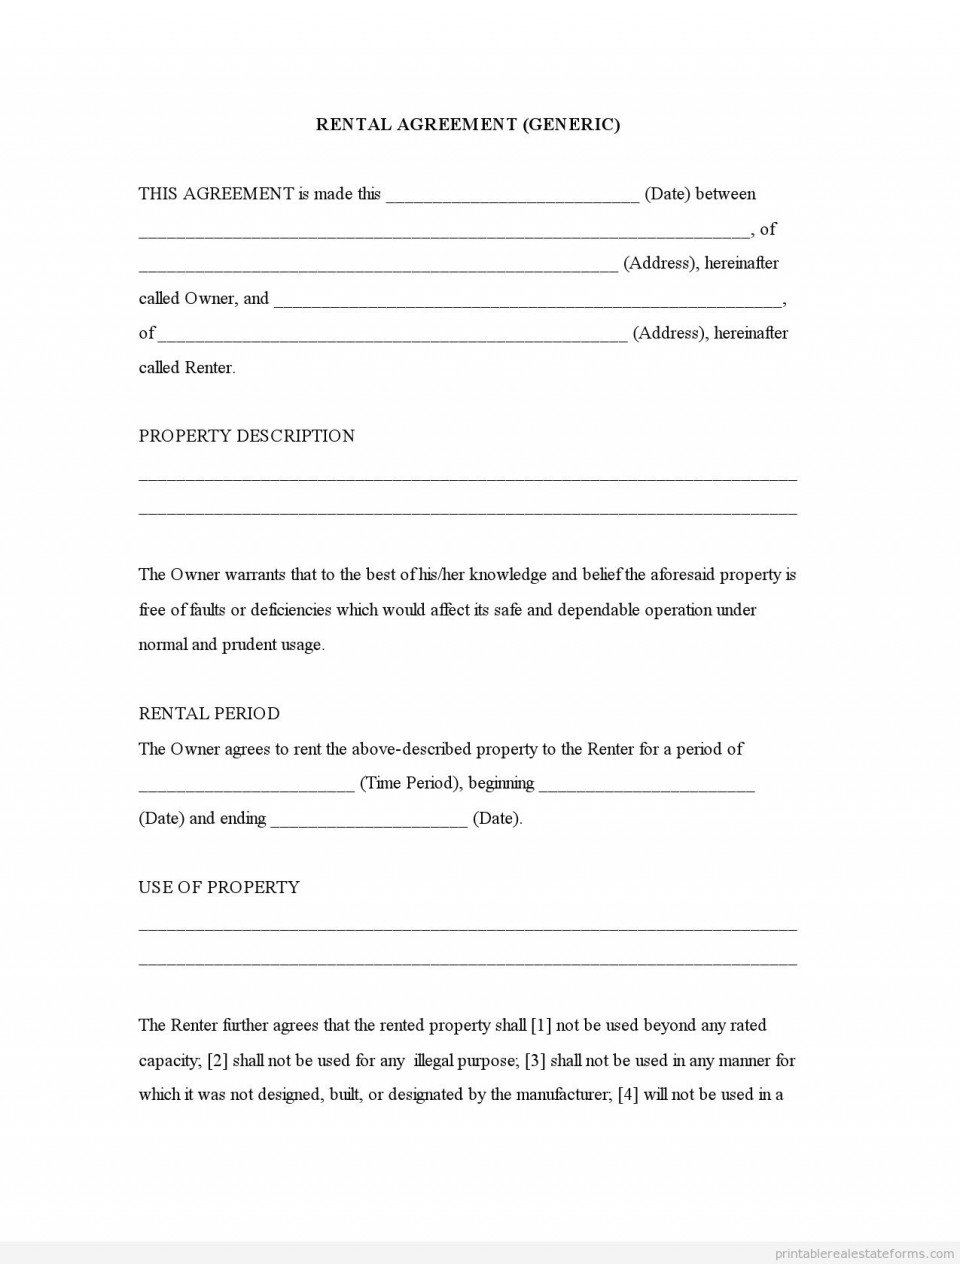 005 Stirring Rental Agreement Template Free Image  Tenancy Form Download Word960